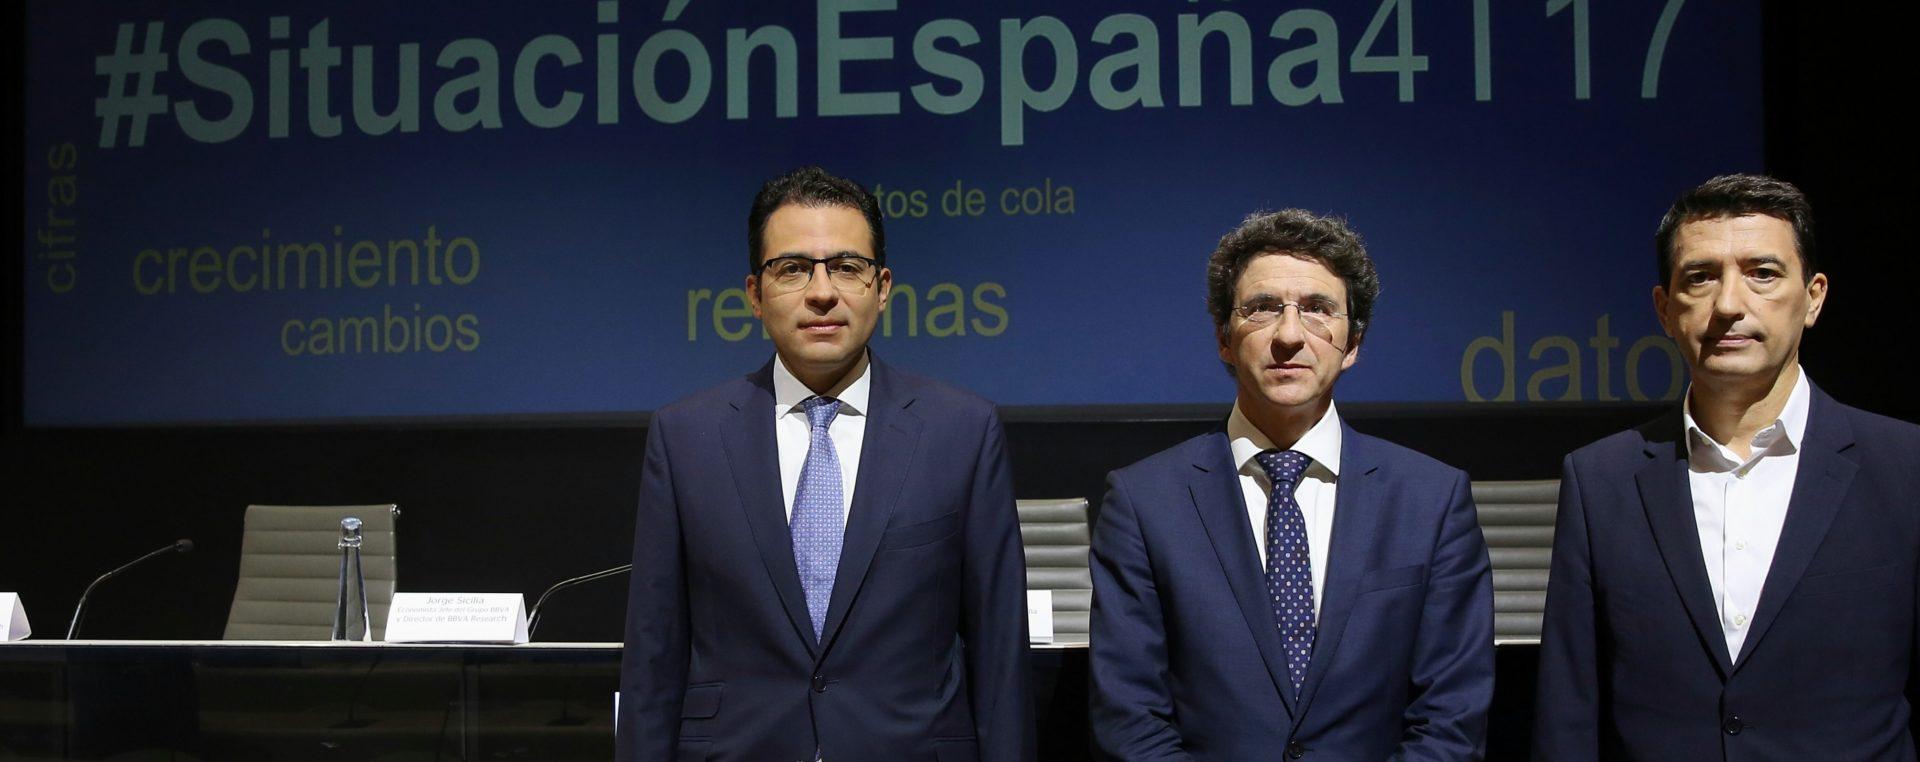 situacion-espana-2017-bbva